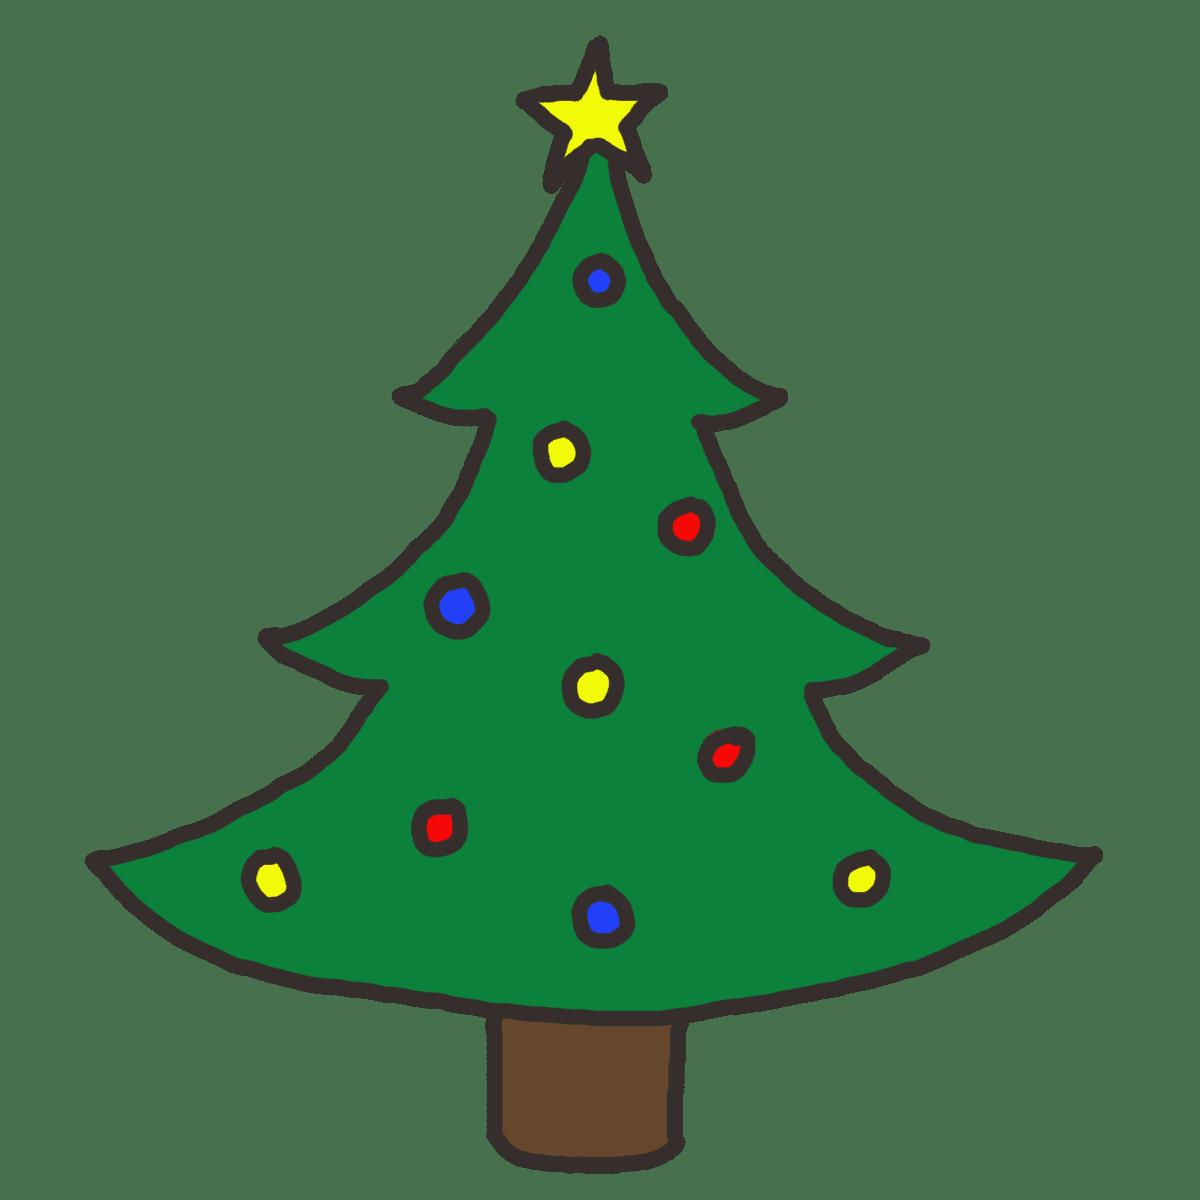 A cartoon Christmas tree with lights and a star